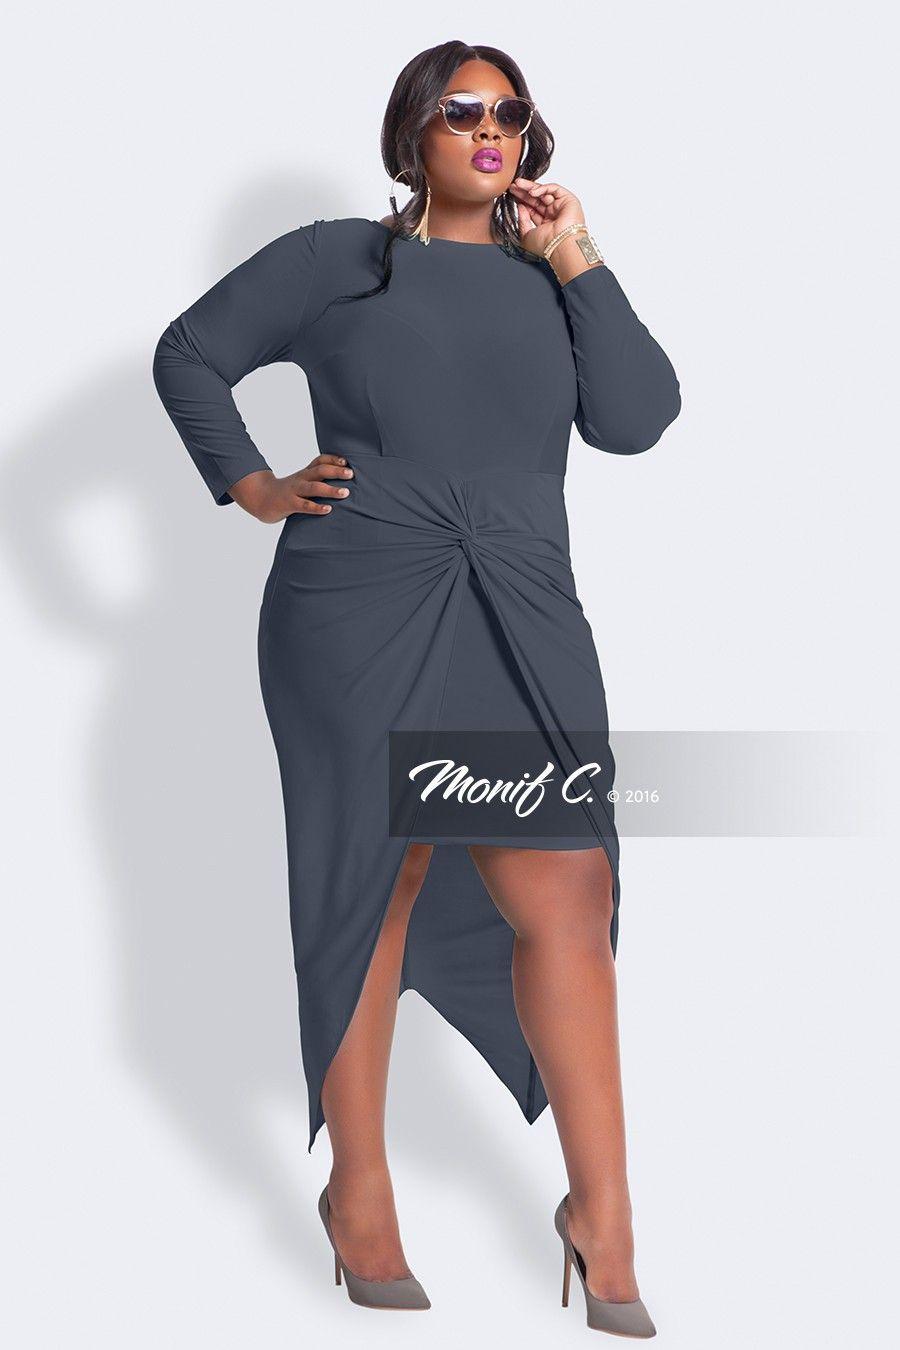 Gigi Knotted Plus Size Dress - Charcoal - Monif C $118 | The ...